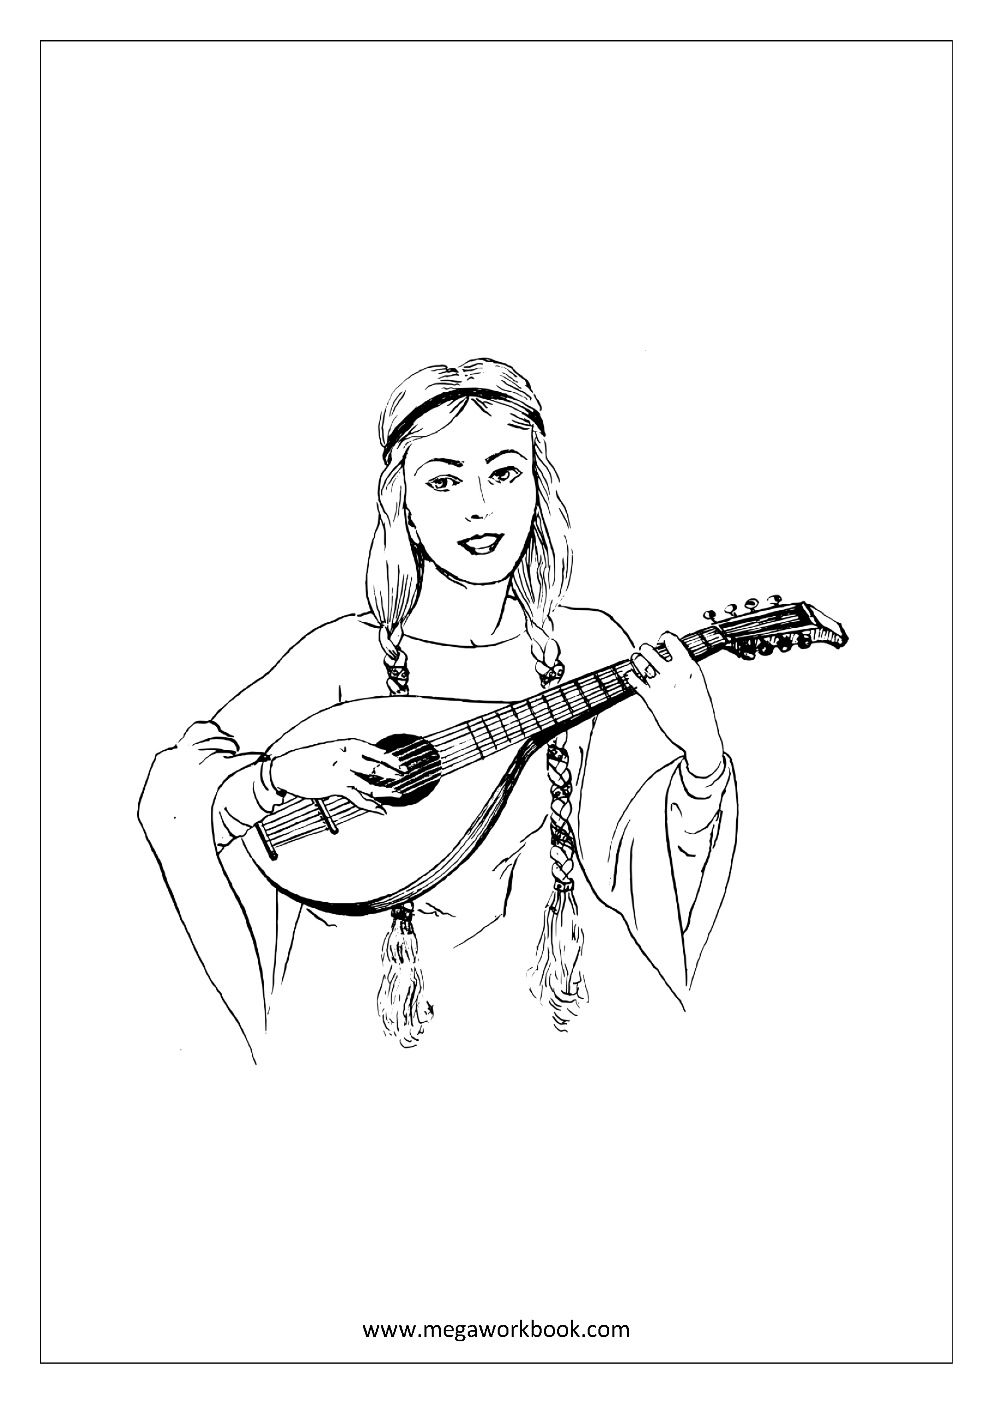 Free Coloring Sheets Musical